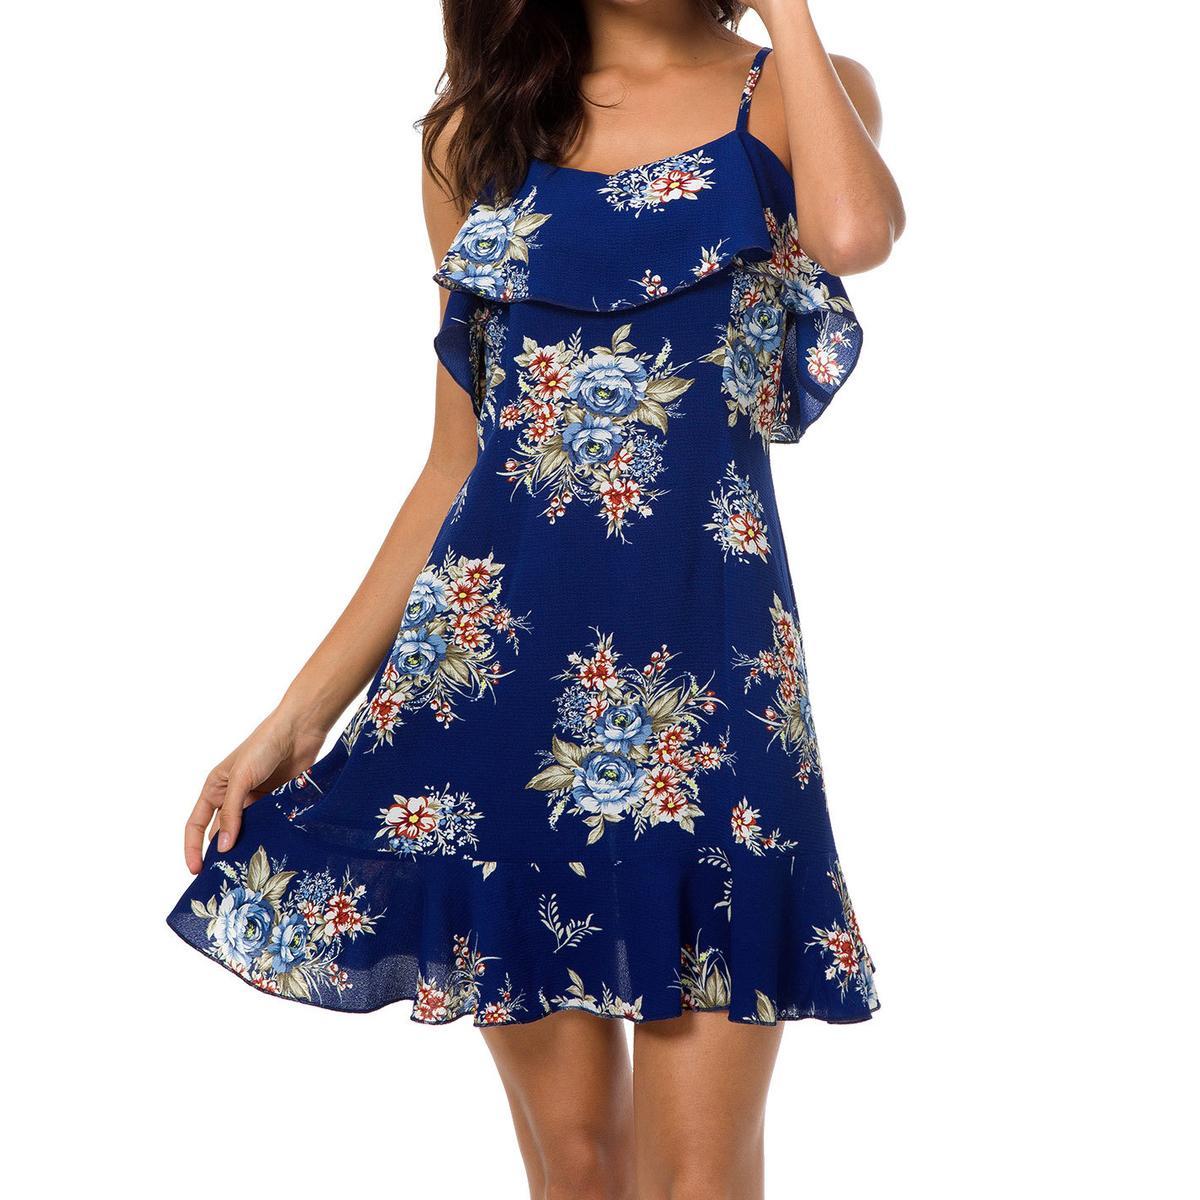 bdfda112 Girls Kawaii Beach Ruffles Floral Printed Mini Dress Female Boho Sundress  Women Spaghetti Strap Backless Plus Size Dresses GV897 Beaded Dress Couture  ...